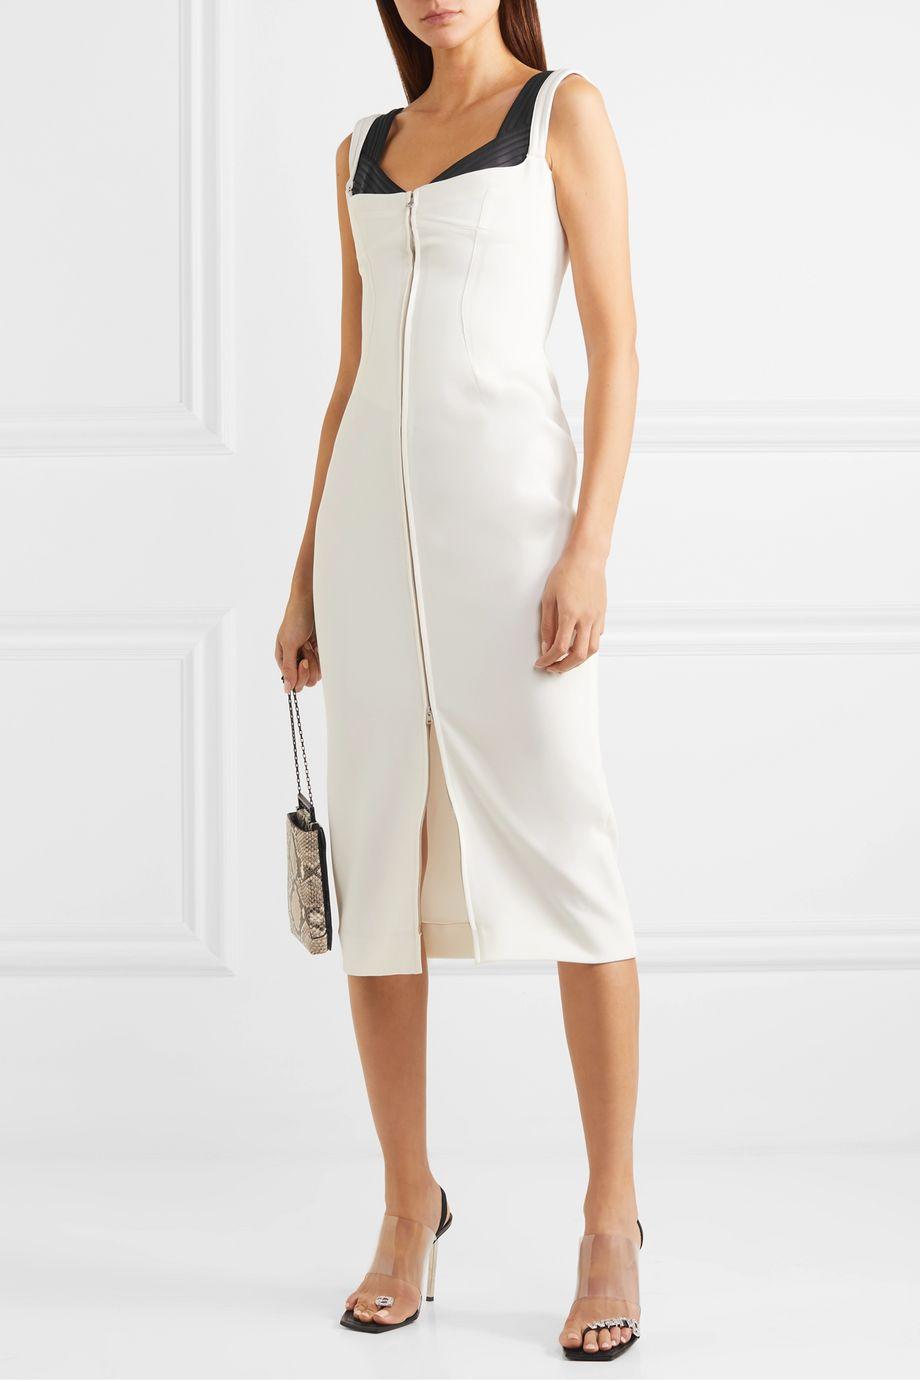 Mugler Two-tone layered crepe midi dress